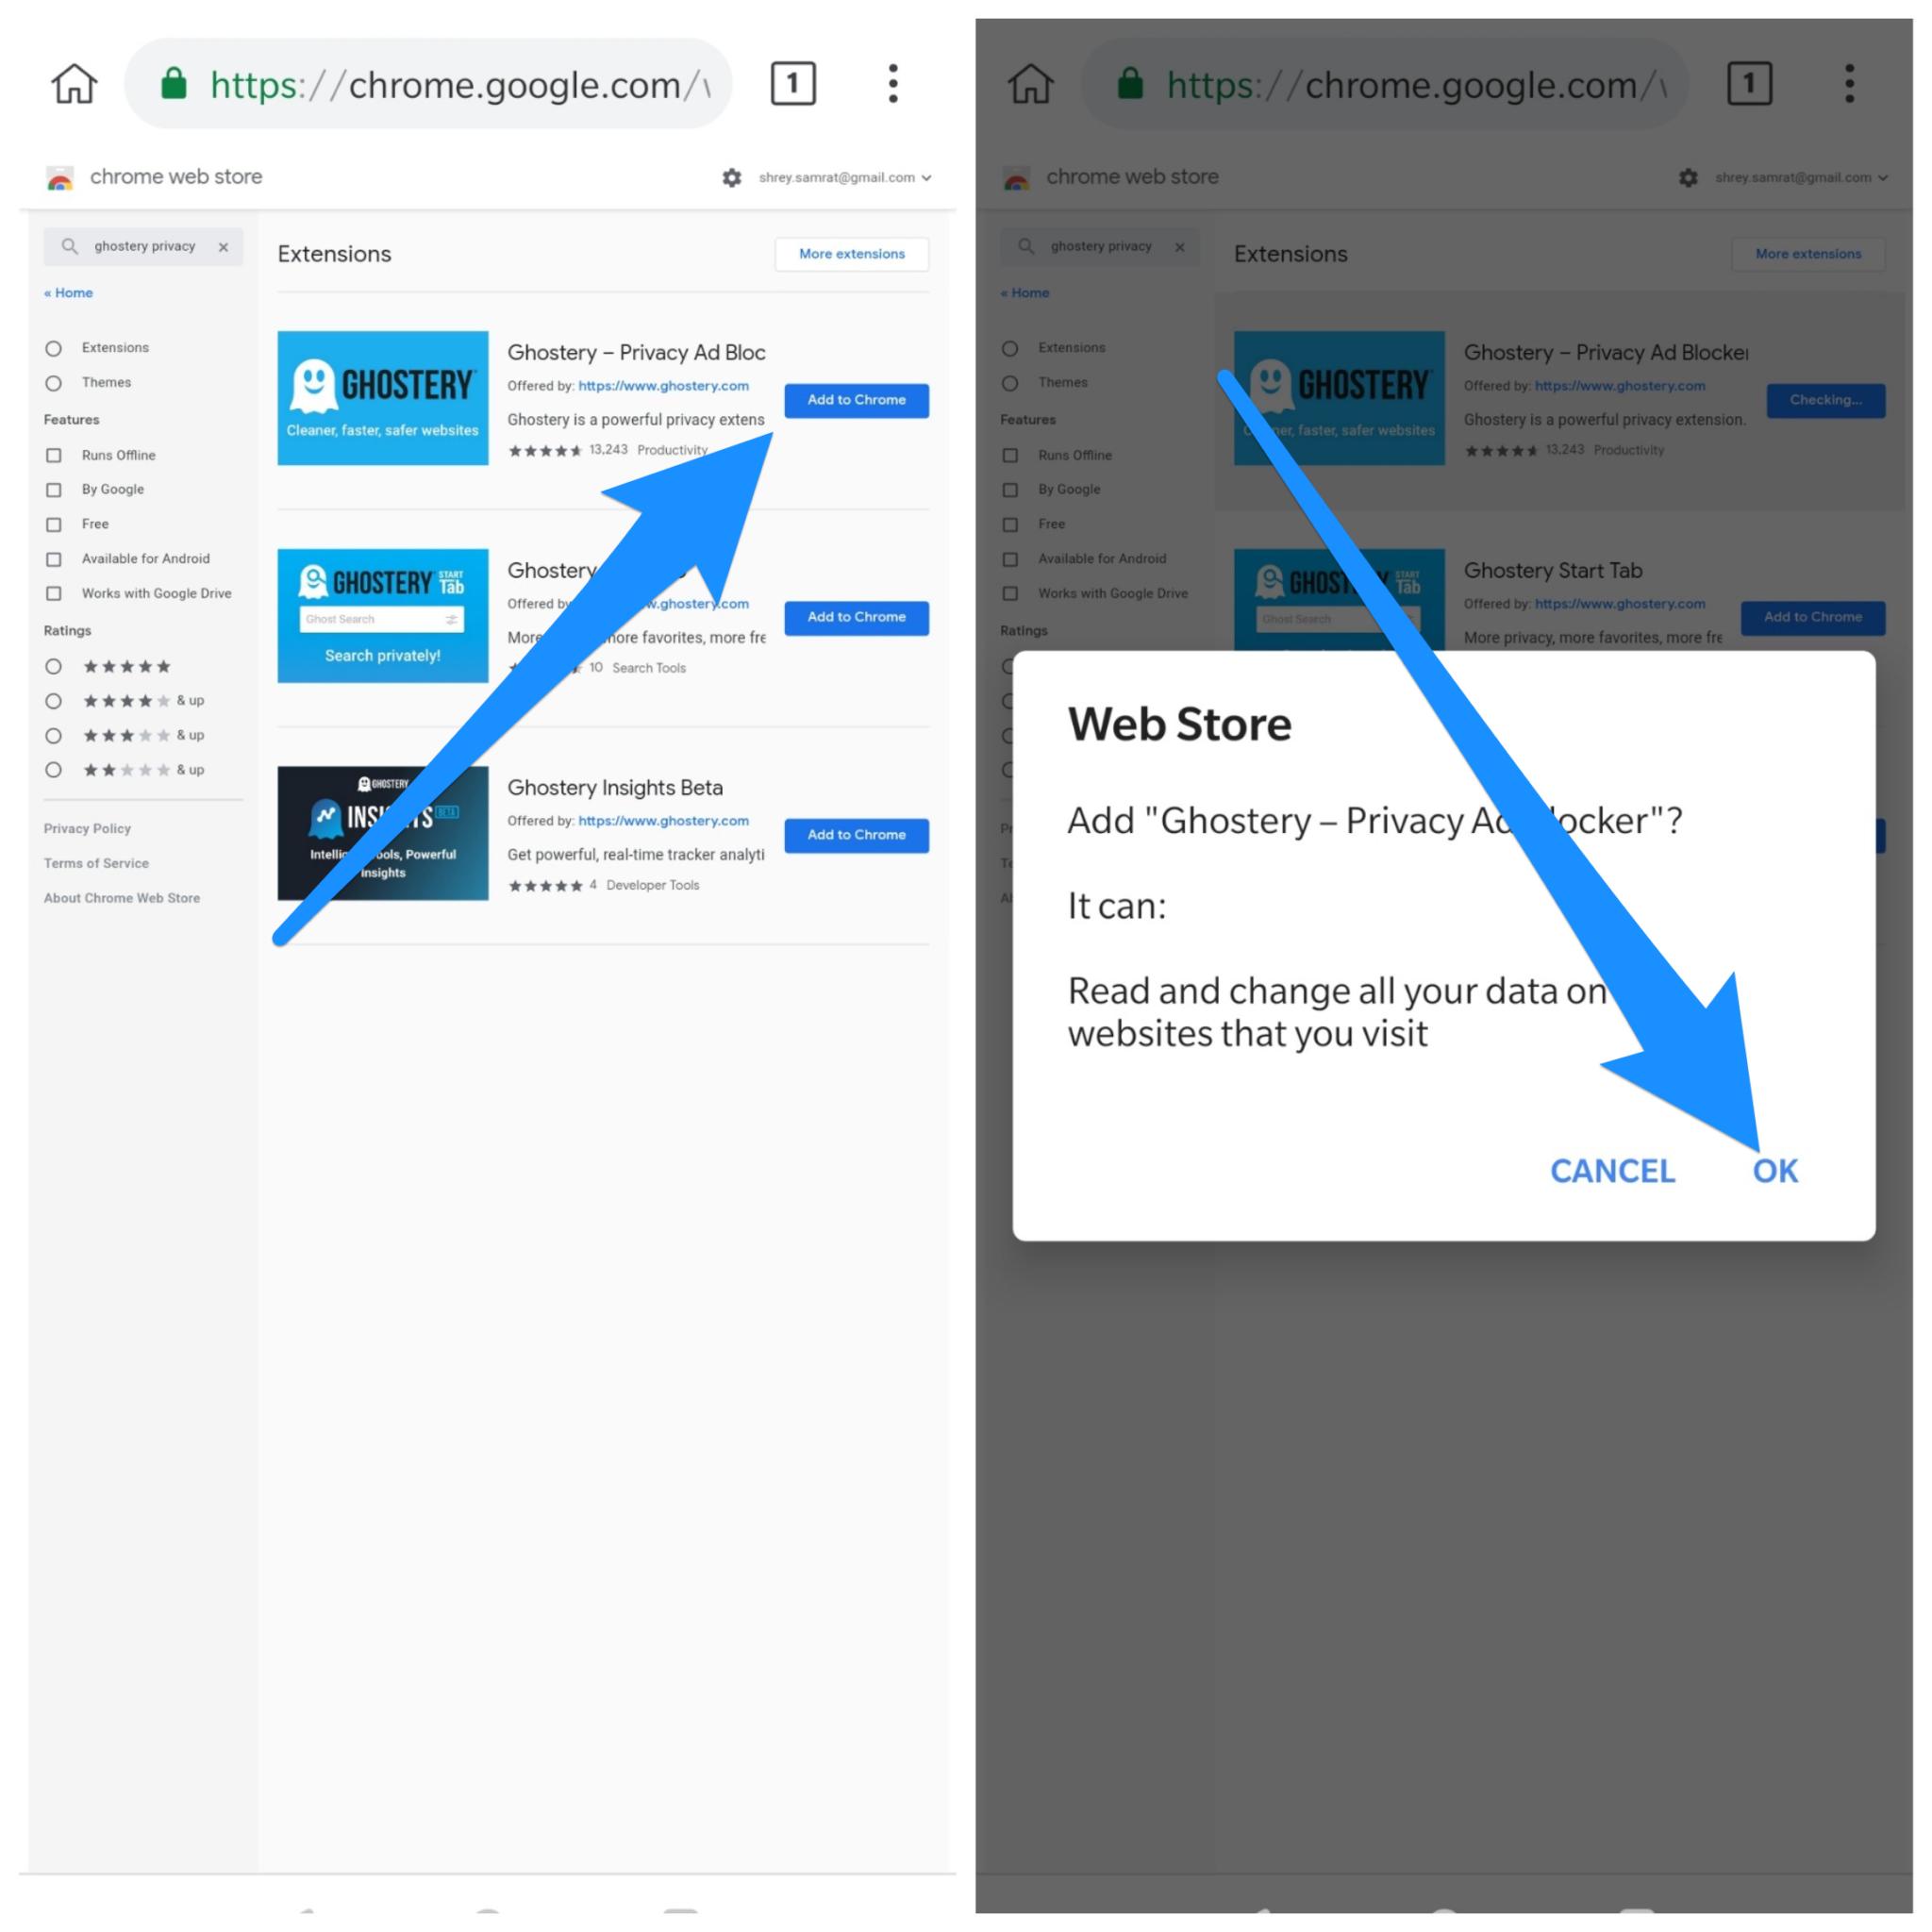 在Android浏览器上安装Google Chrome扩展程序